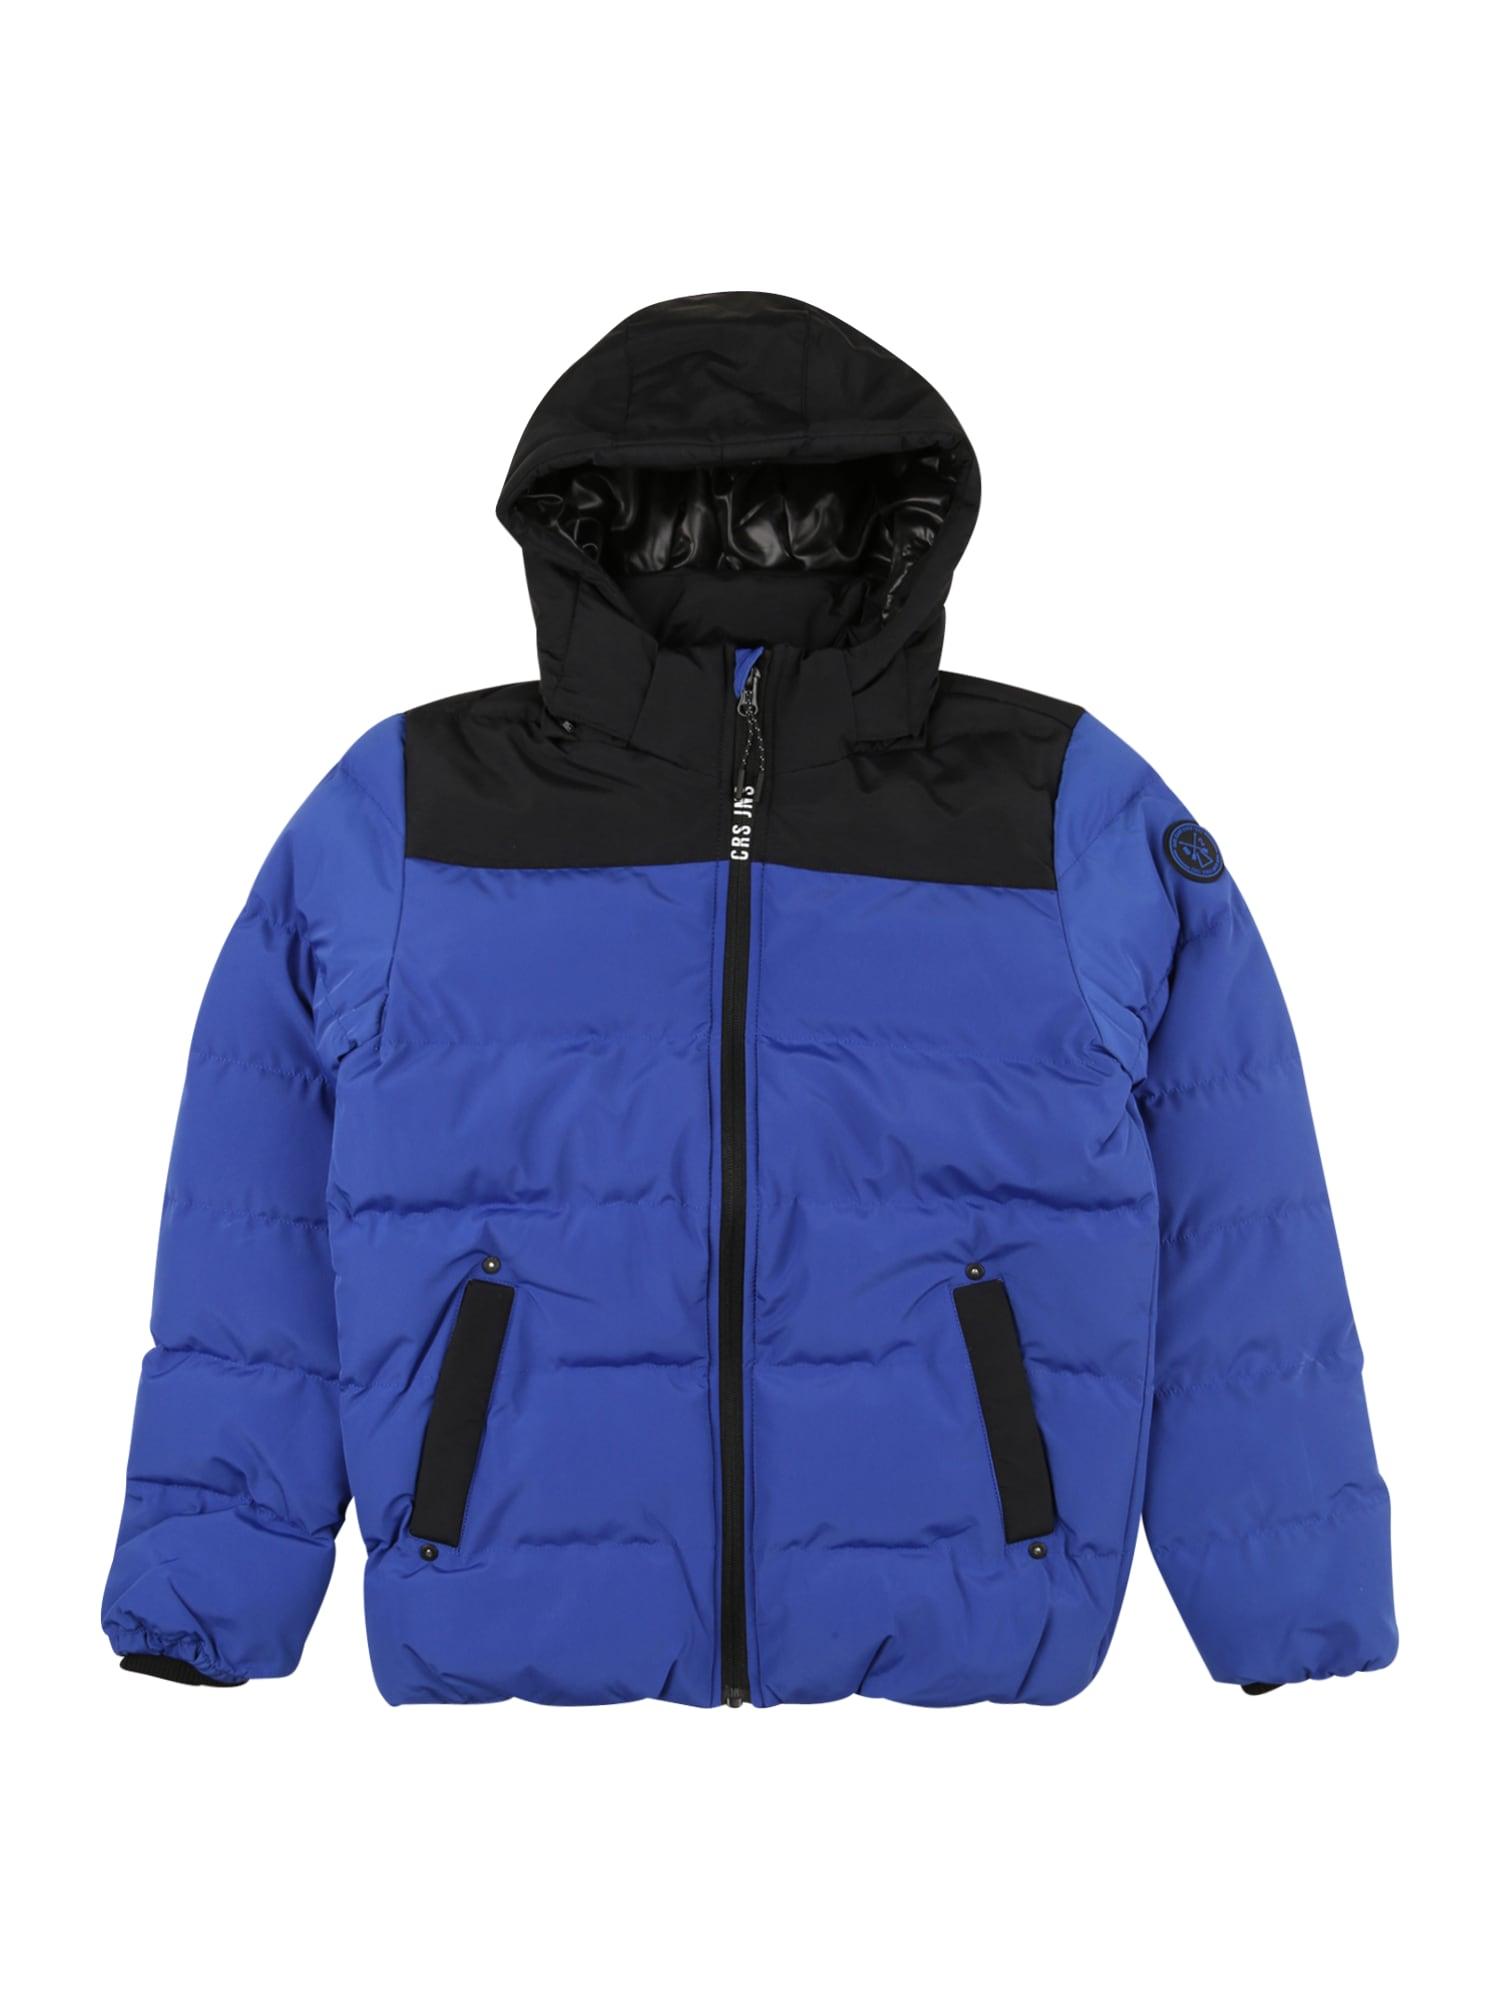 Cars Jeans Žieminė striukė 'SCOLO' kobalto mėlyna / juoda